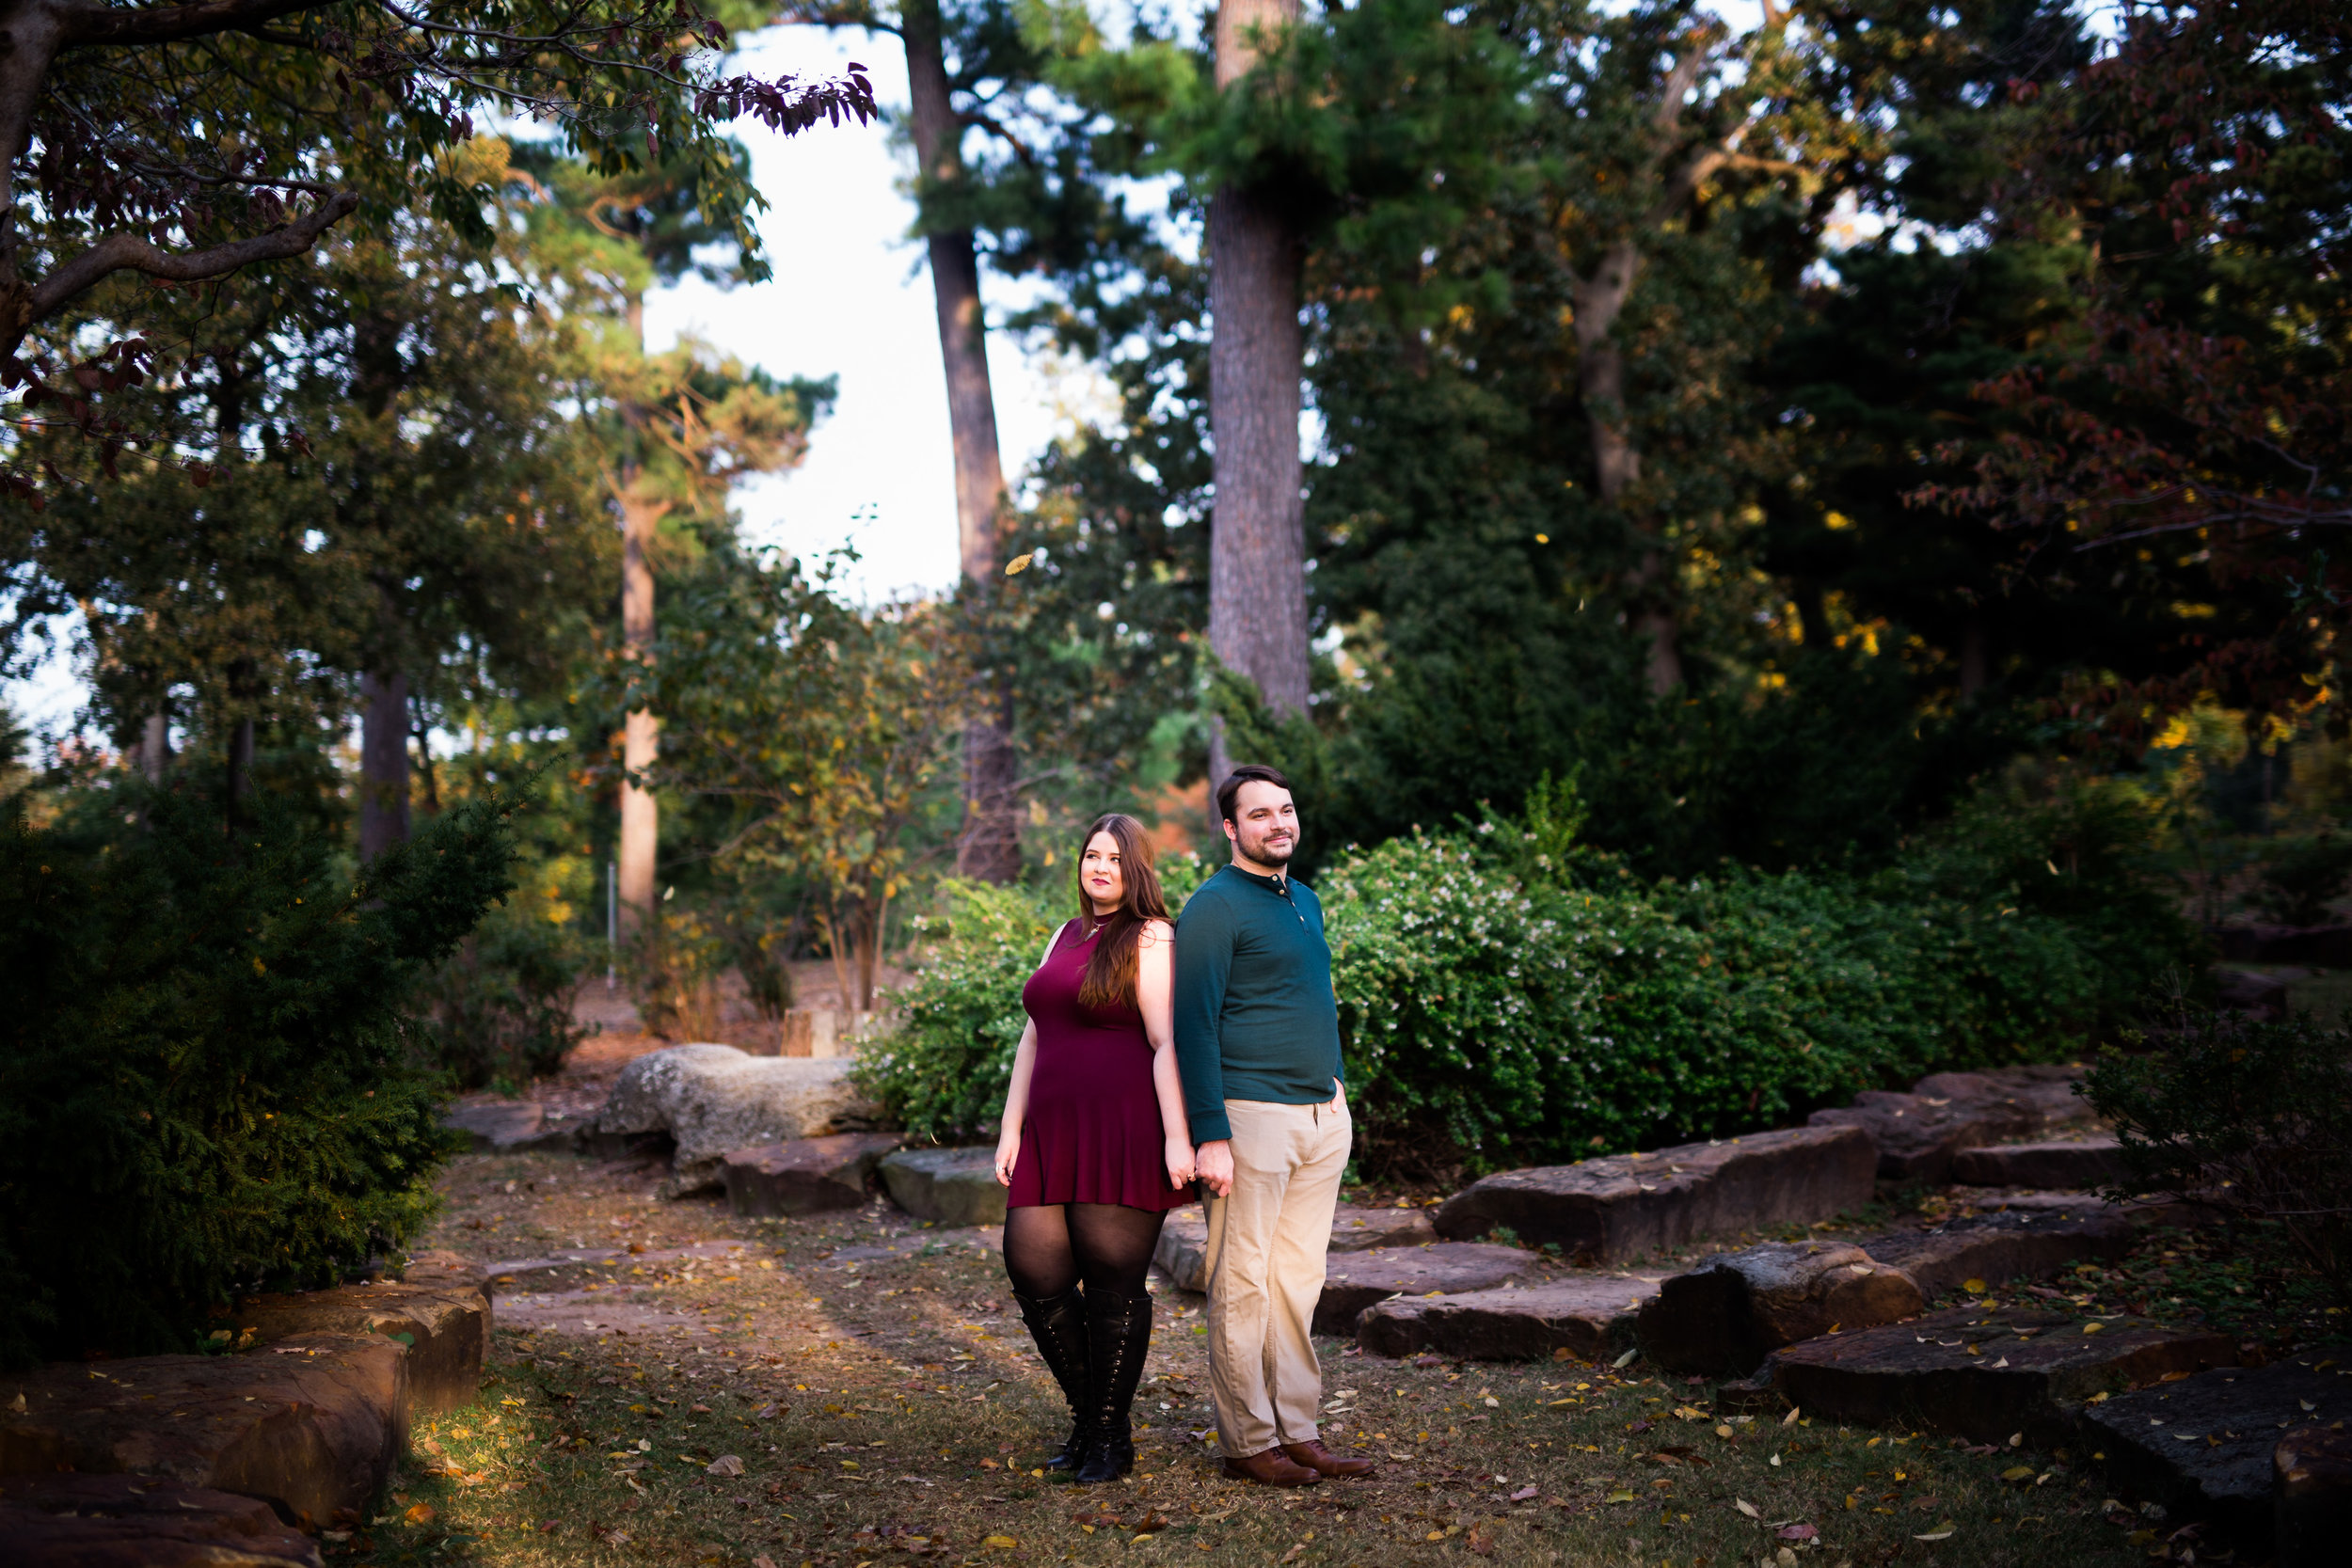 woodward park engagement fall engaged oklahoma tulsa norman orange trees leaves seasons sunset golden hour wedding photographer